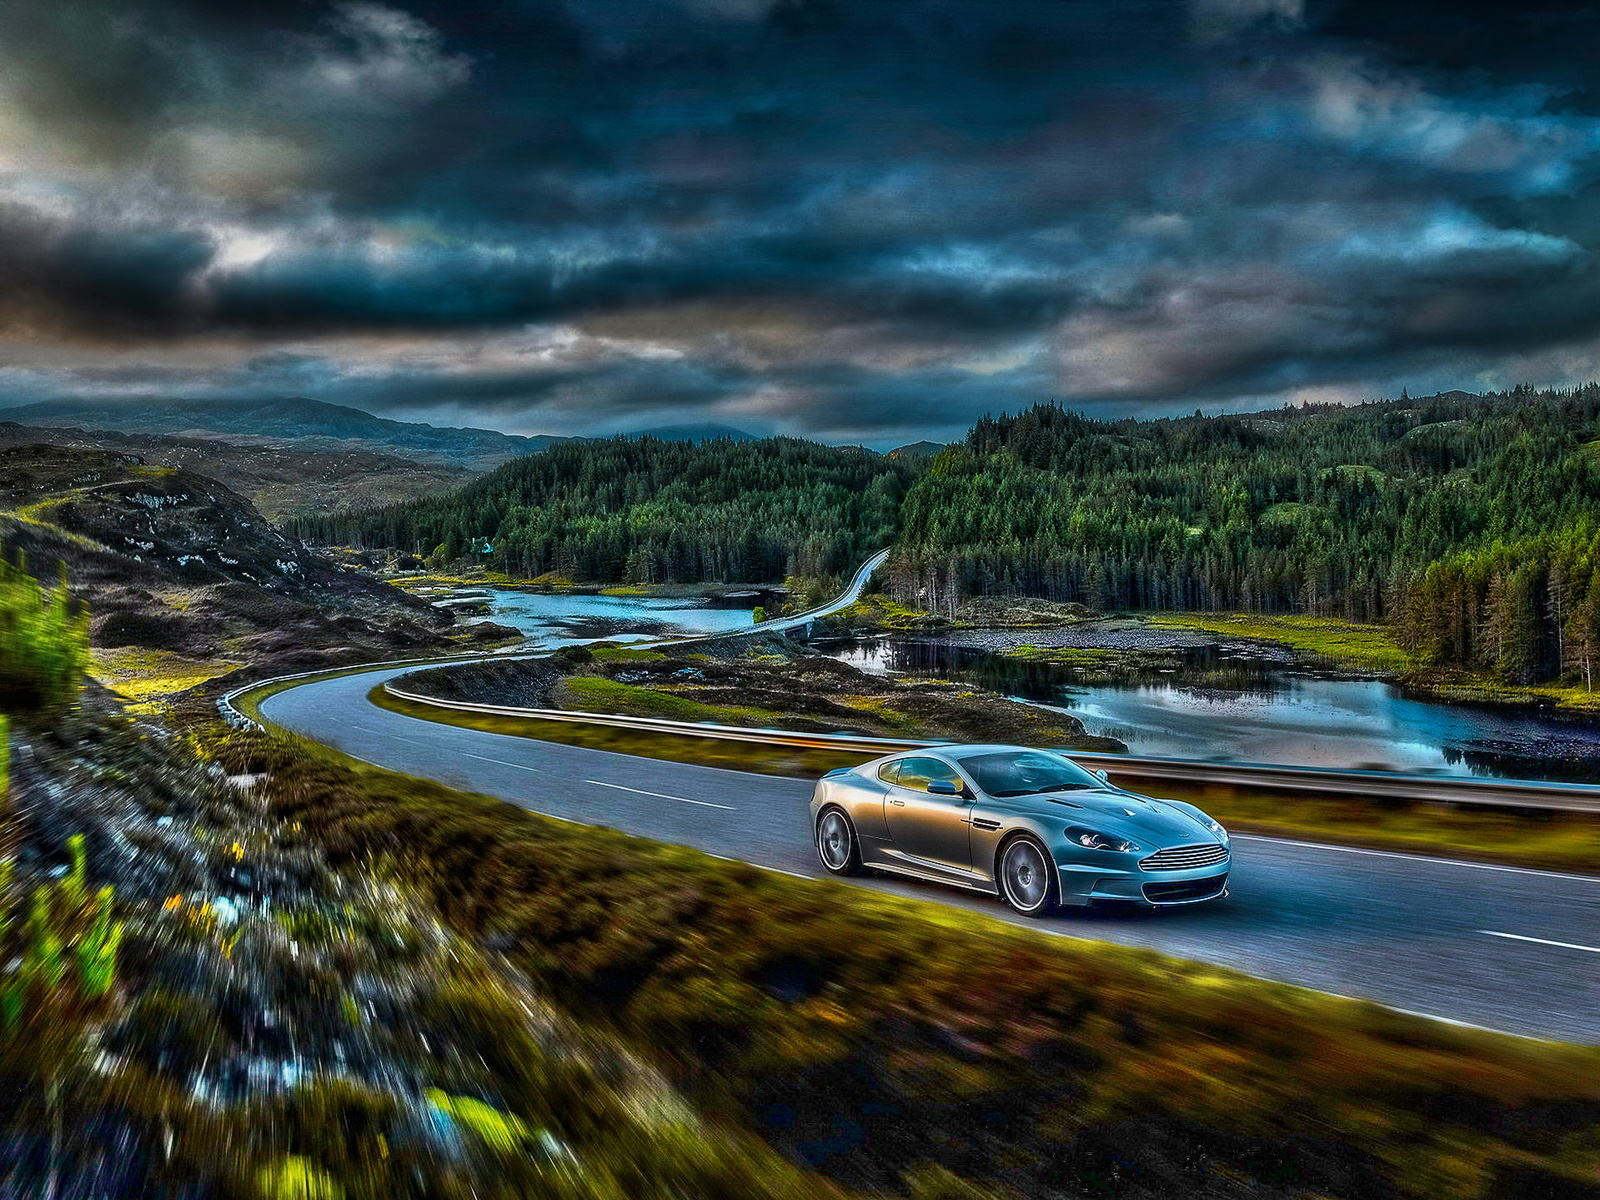 11374 скачать обои Транспорт, Машины, Дороги, Астон Мартин (Aston Martin) - заставки и картинки бесплатно